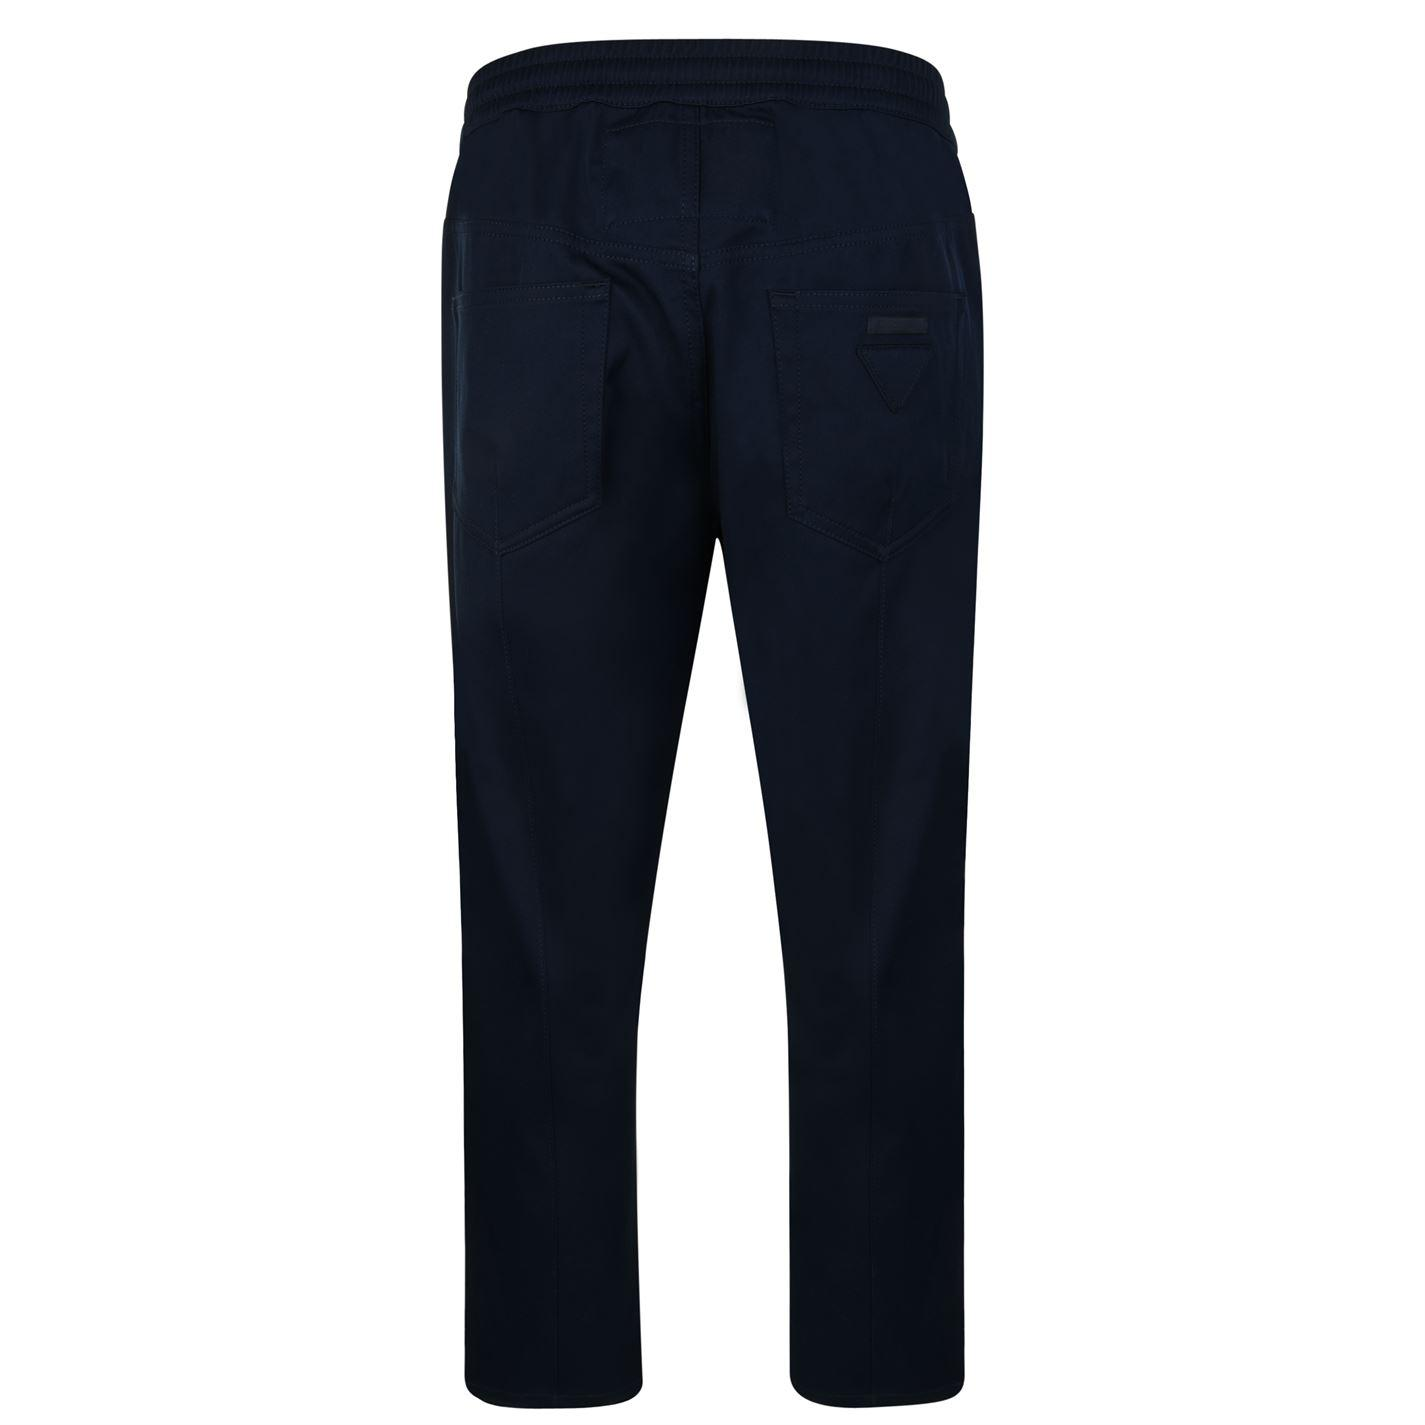 37f1e1bd2ab2 Lyst - Prada Jogging Trousers in Blue for Men